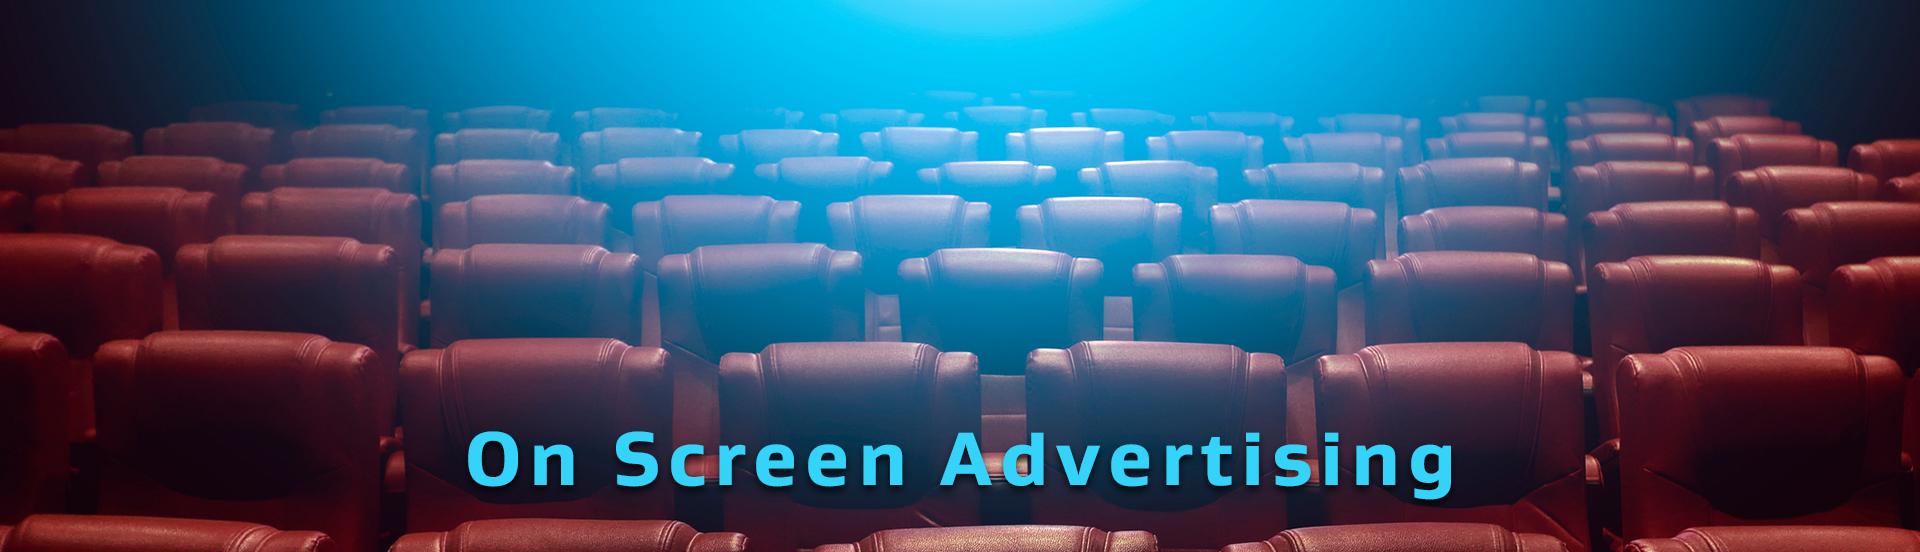 Desktop hero image for On Screen Advertising